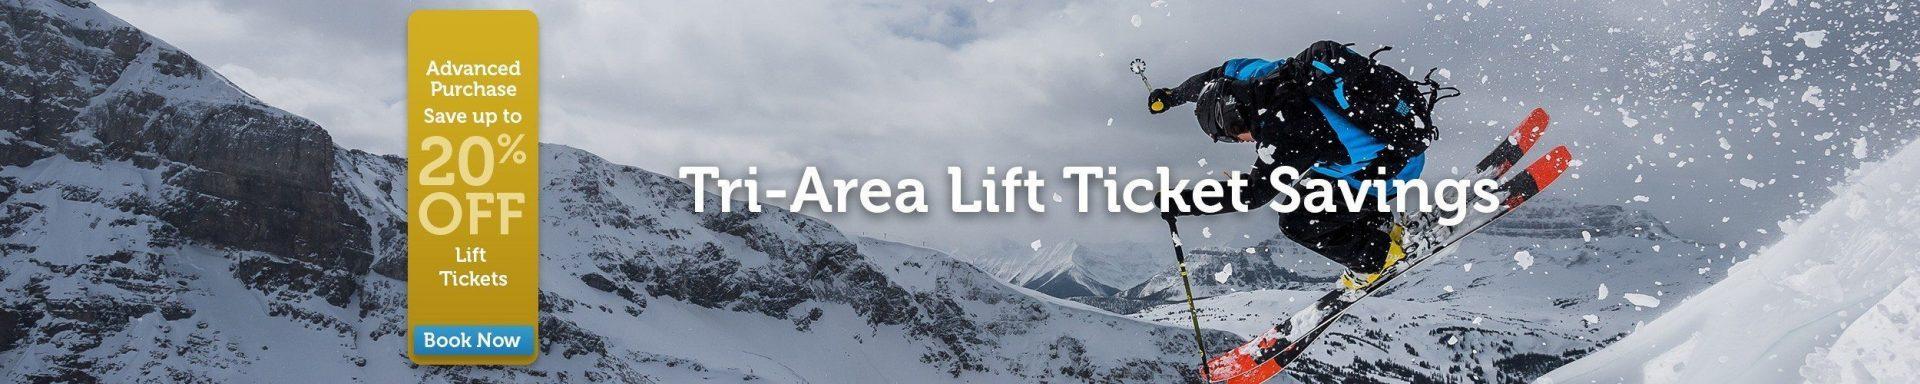 Tri-Area Lift Ticket Savings